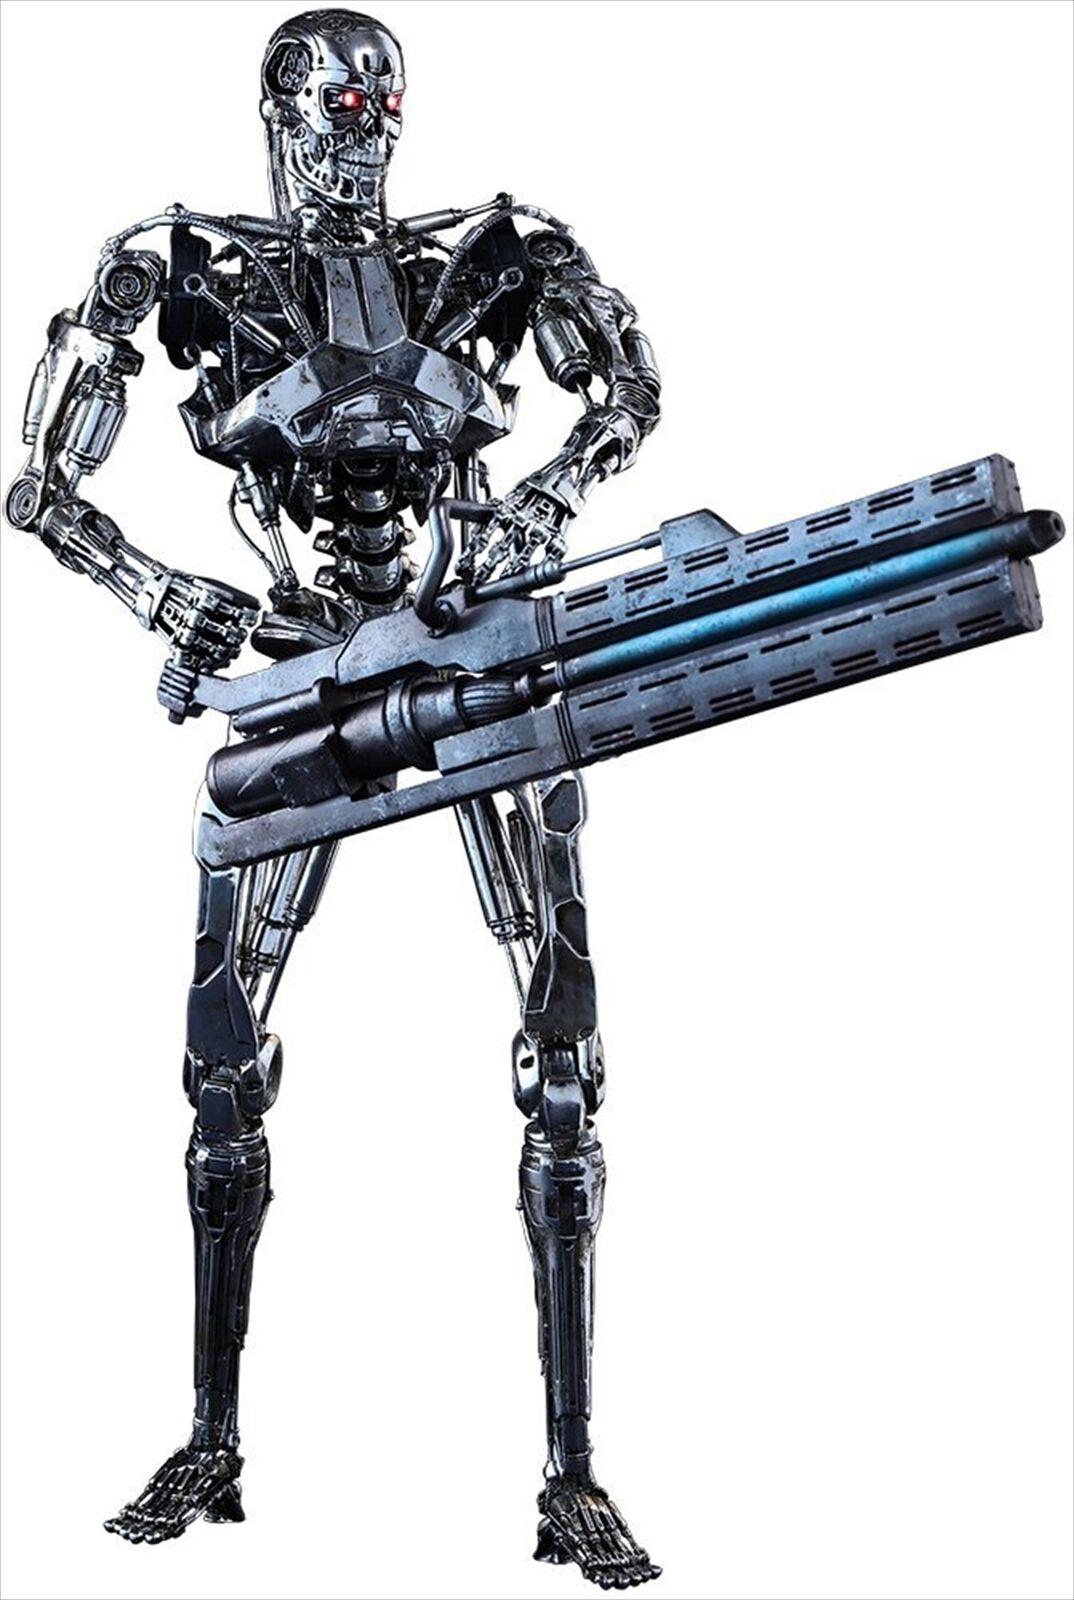 Hot Toys Movie Masterpiece Terminator Genisys final esqueleto 16 Figura De Acción